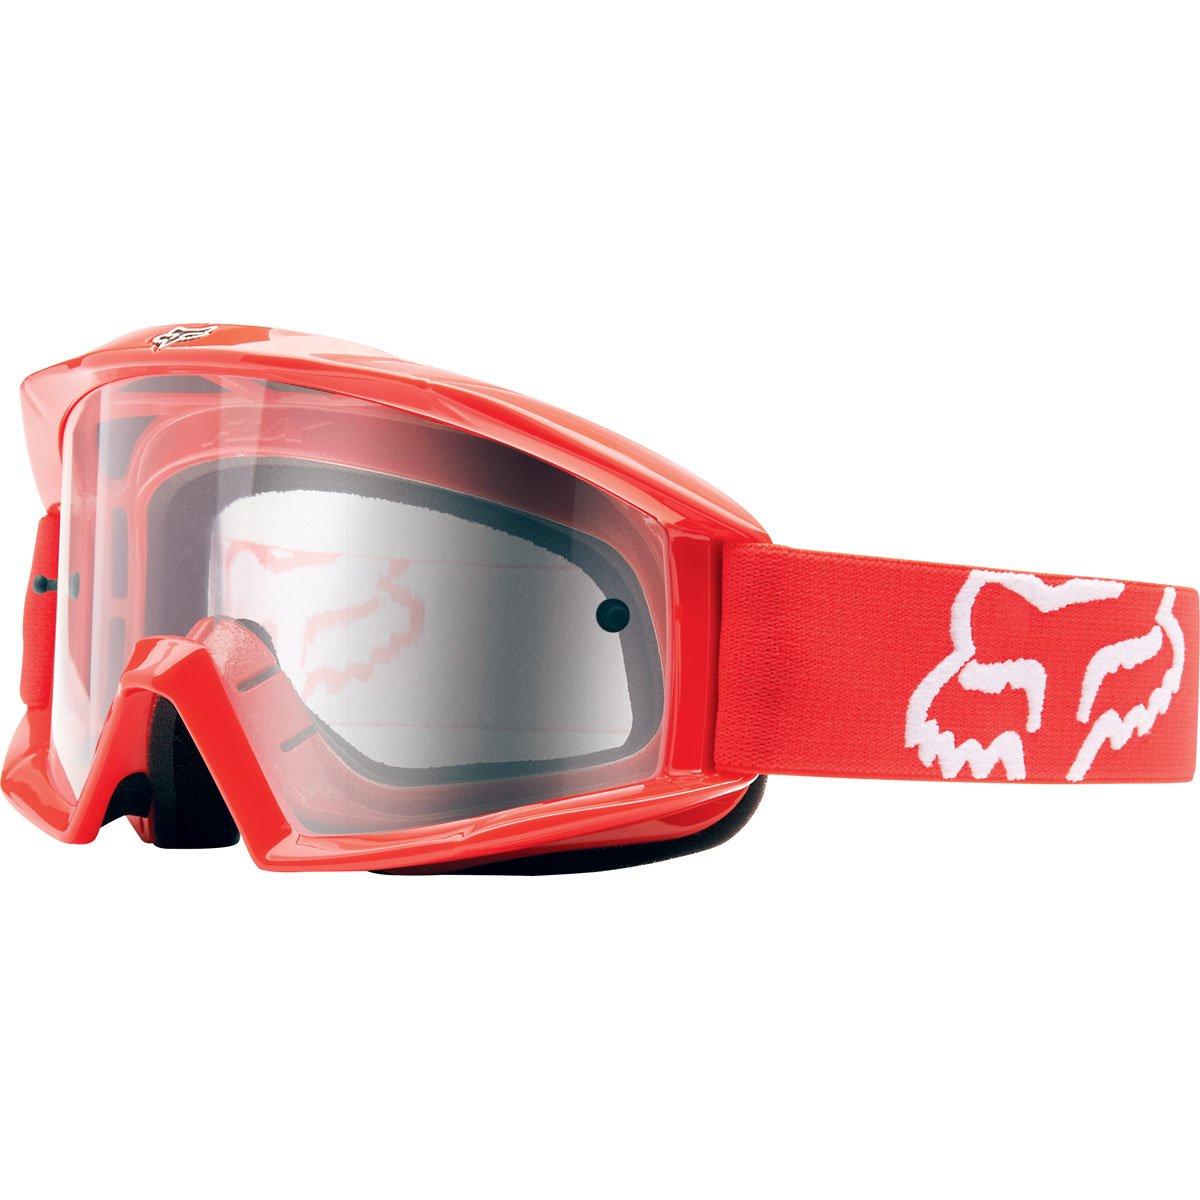 Fox Racing Main Adult Moto Motorcycle Goggles Eyewear - Red/One Size